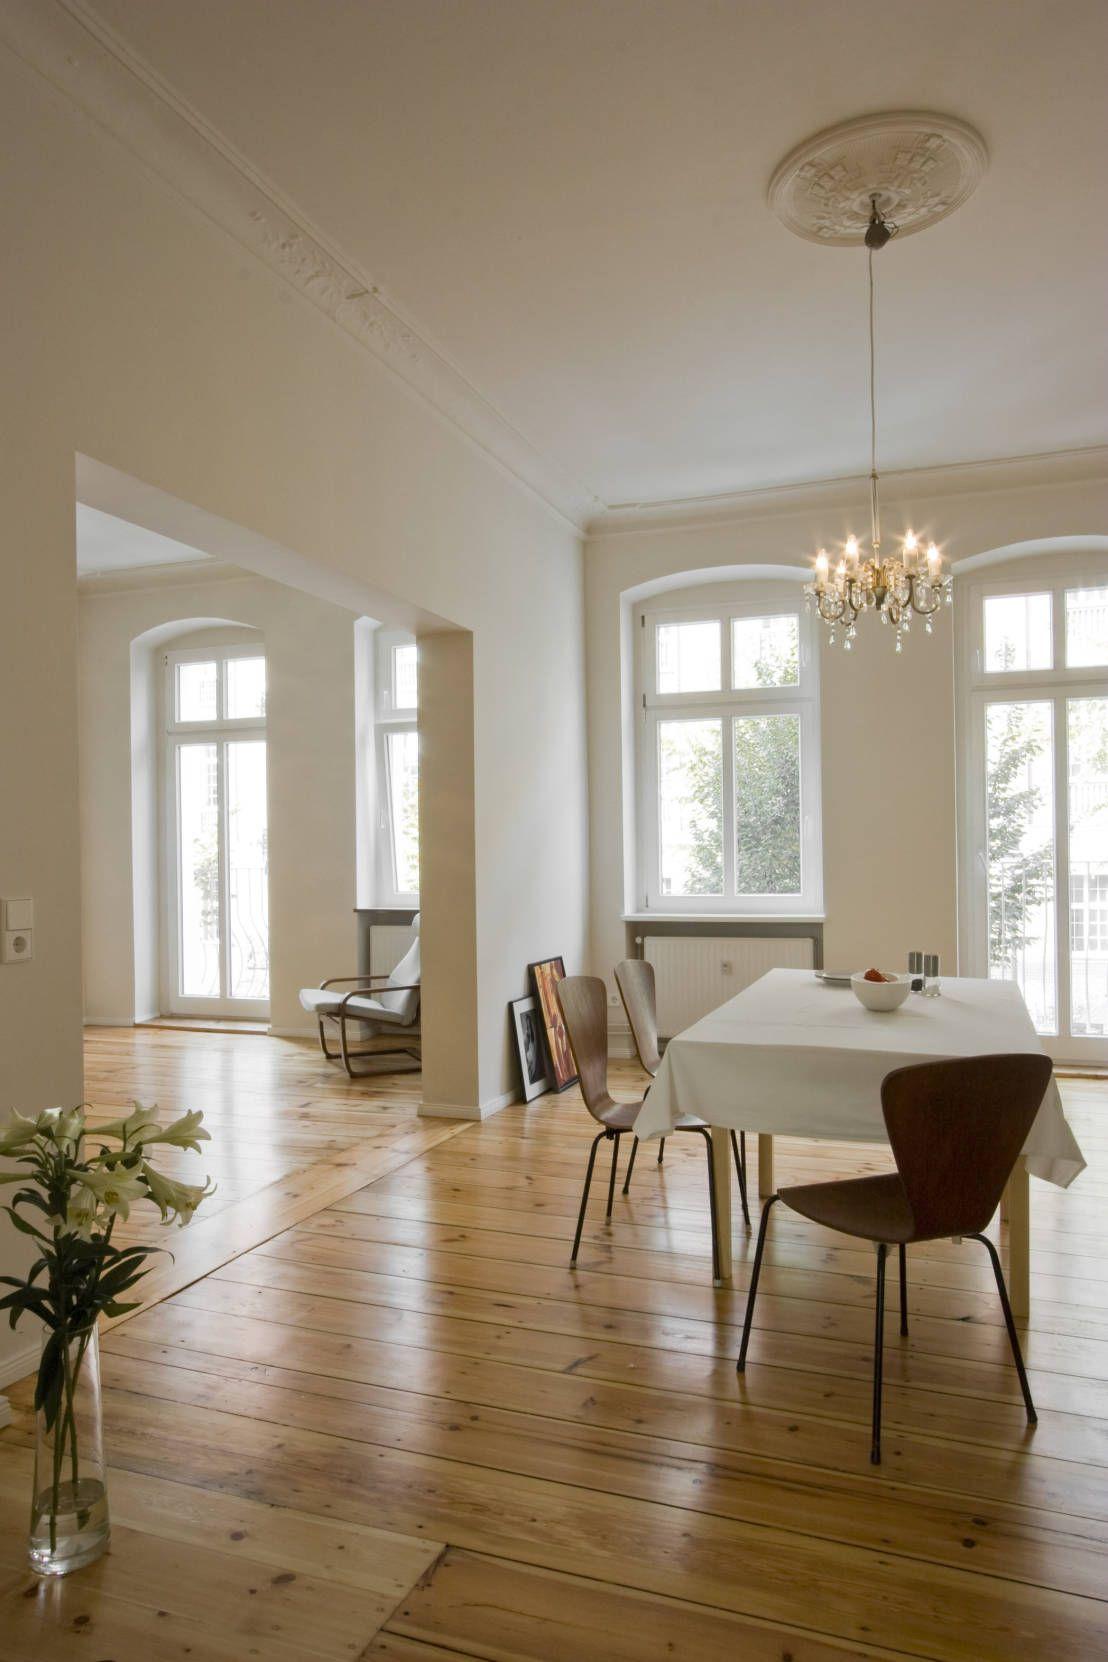 Moderner Stuck modernisierte altbauwohnung boden interiors and room